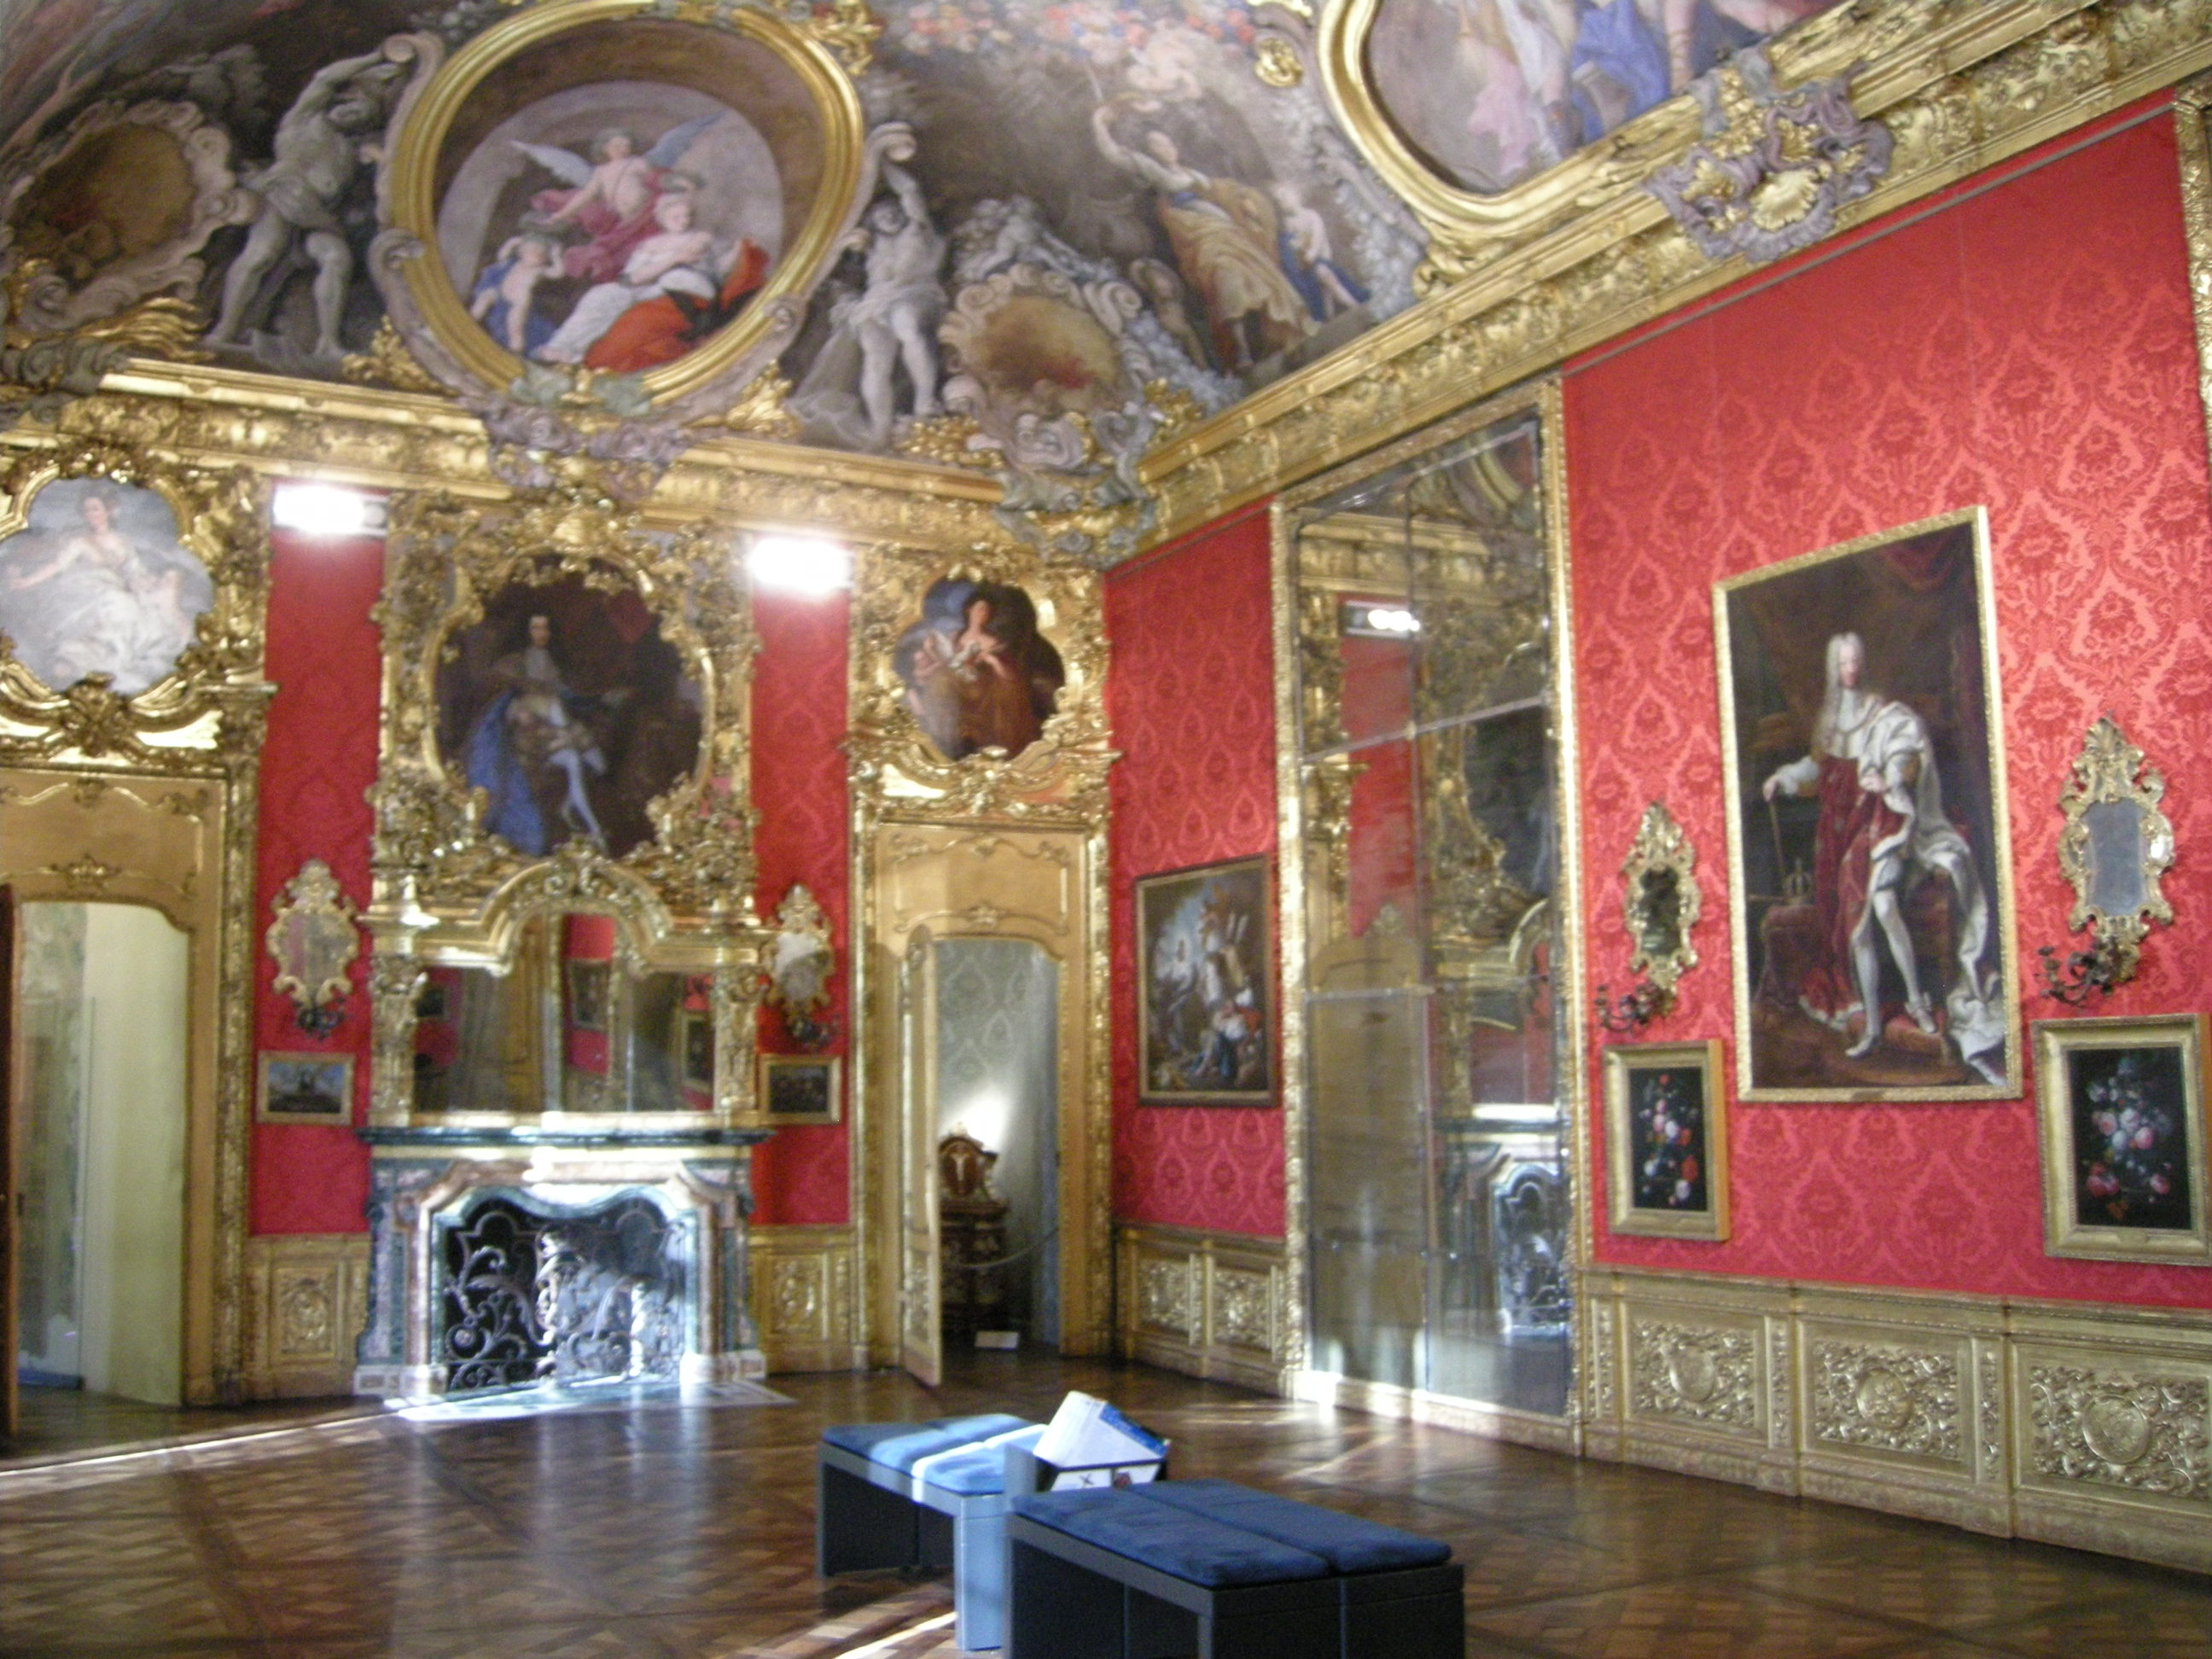 Palazzo_madama_torino,_piano_nobile_08